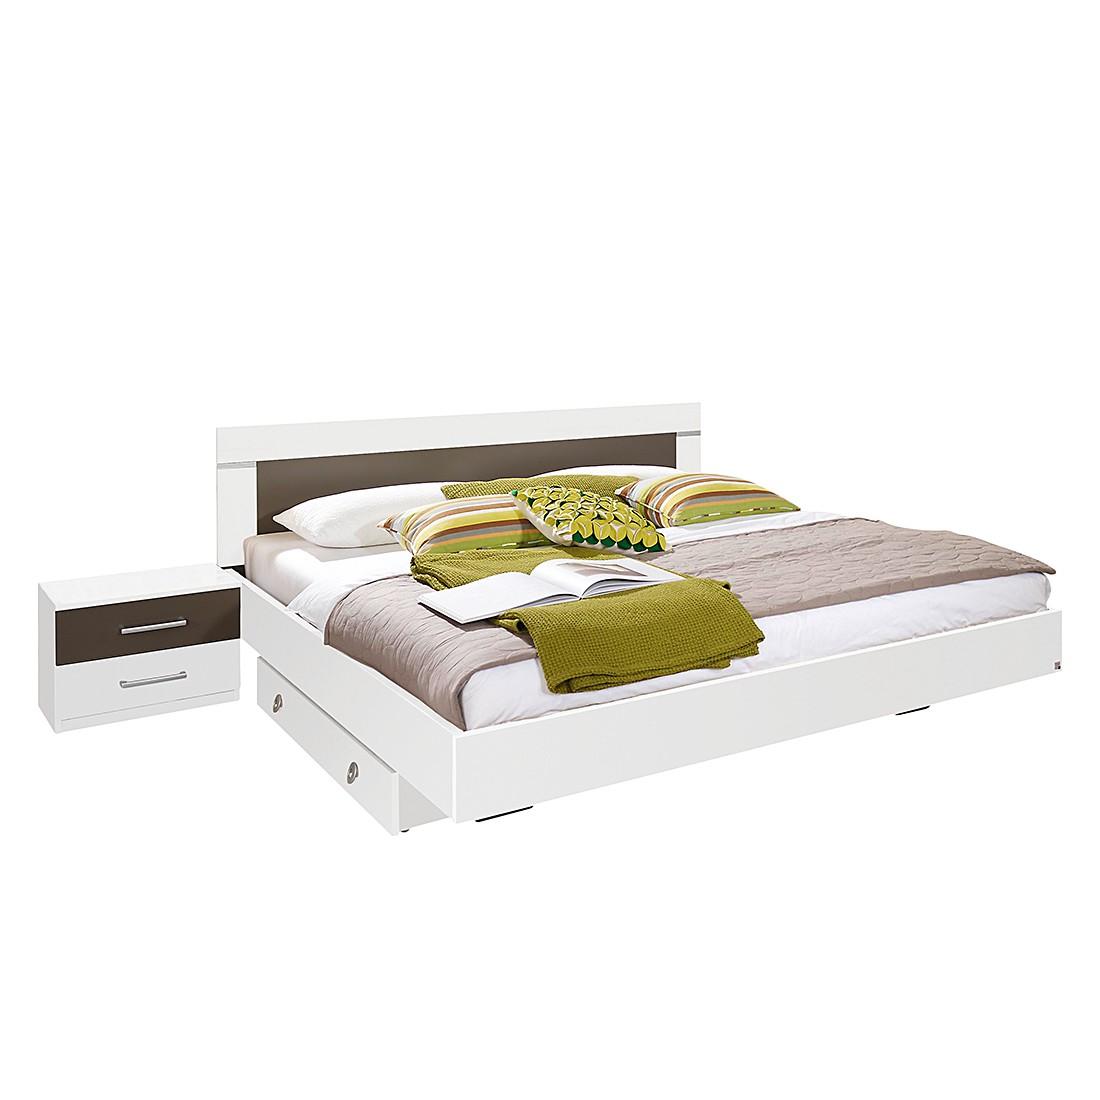 Letto Ikea Flaxa: Flaxa headboard with storage compartment ikea. Flaxa underbed white cm ikea.